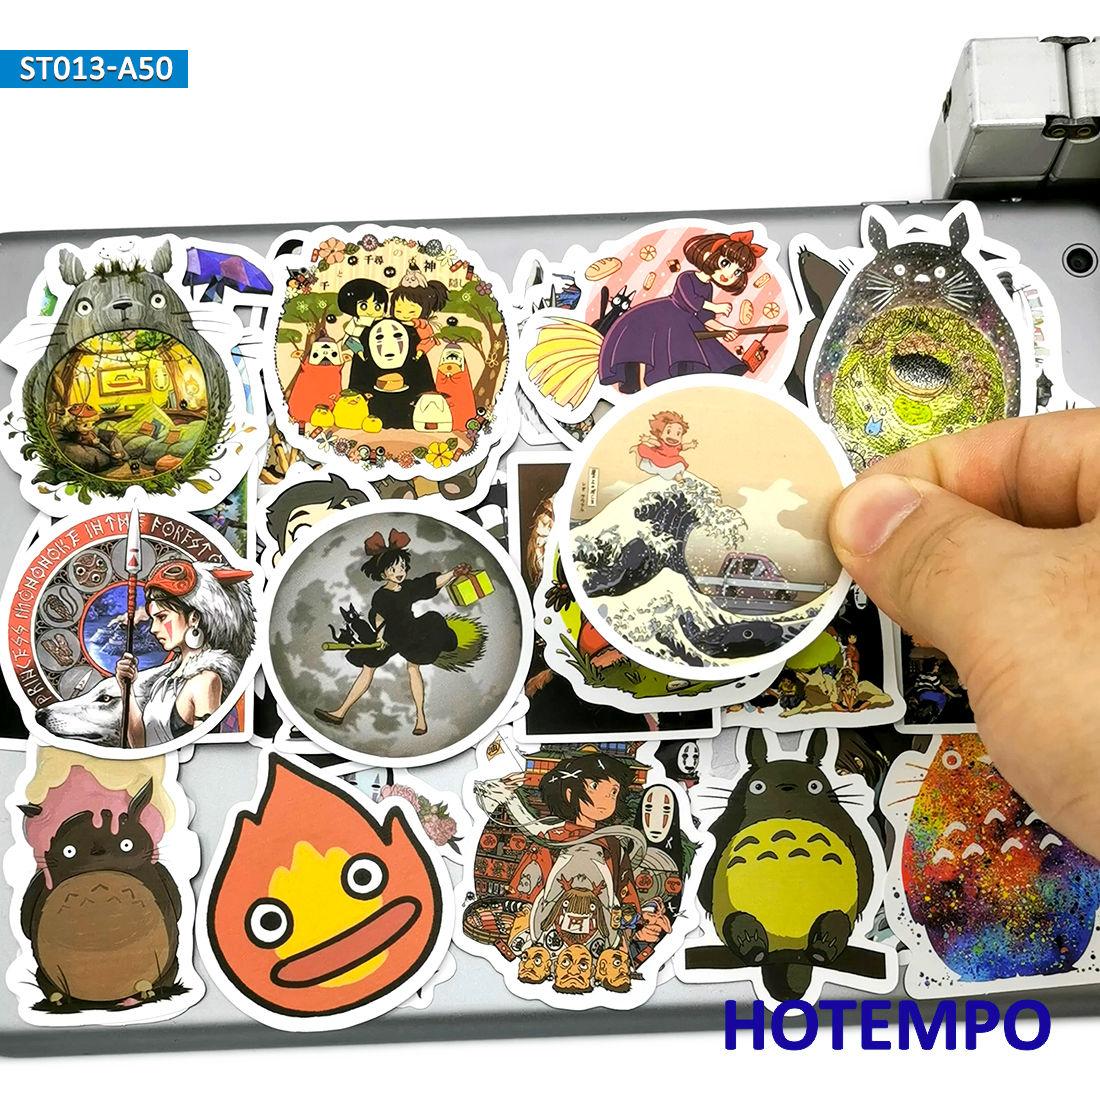 50pcs Japan Anime Movie Miyazaki Hayao Cartoon Cute Stickers Toys For Kids Mobile Phone Laptop Luggage Skateboard Decal Stickers